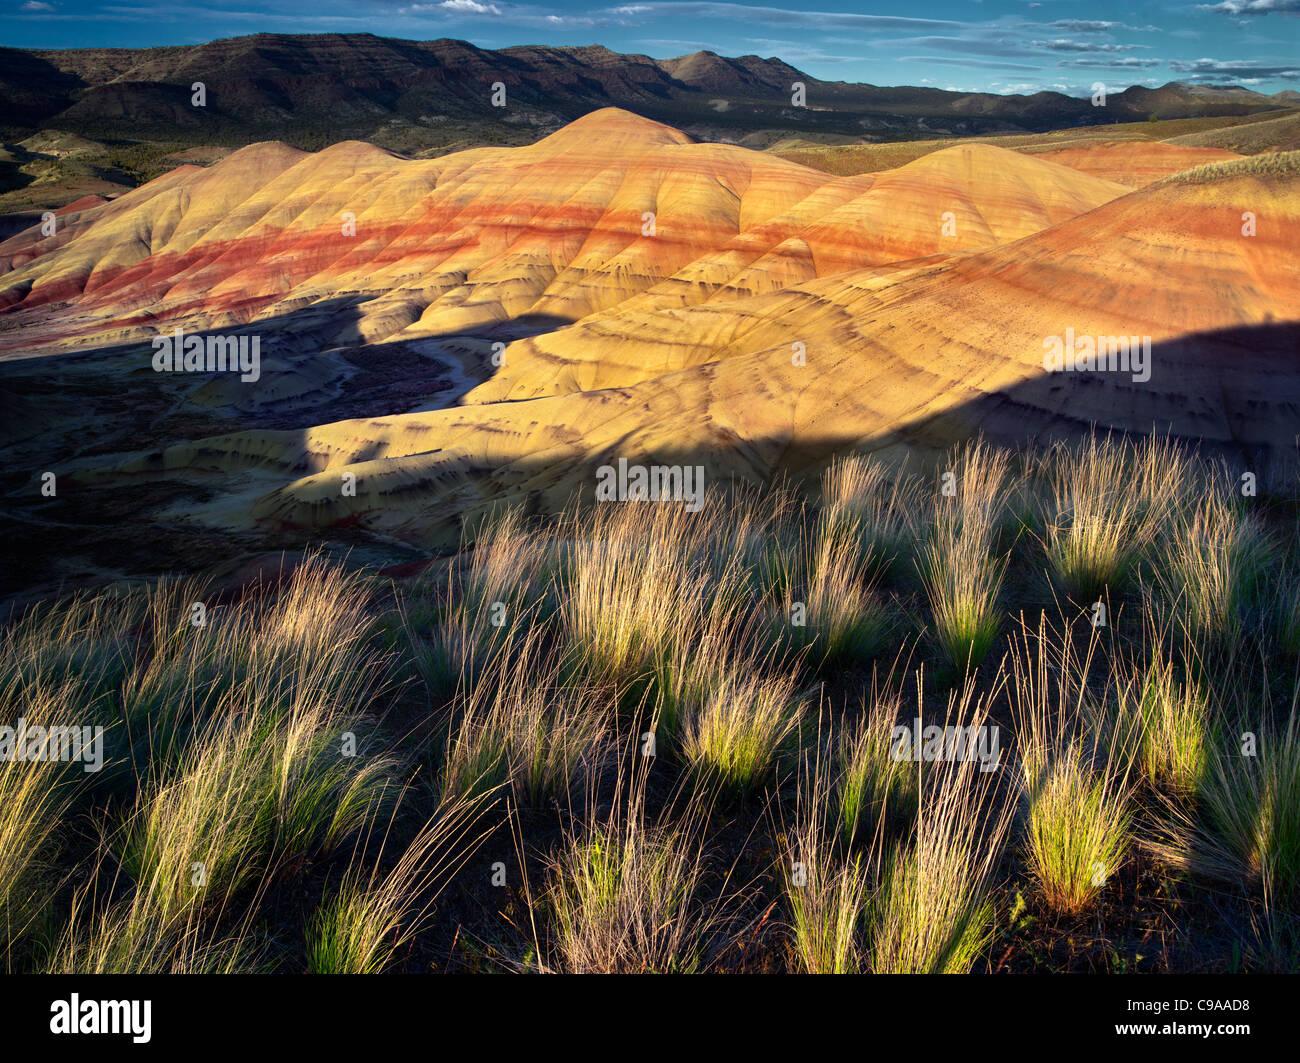 Grass und gemalten Hügeln. John Day Fossil Beds Nationalmonument. Oregon Stockfoto